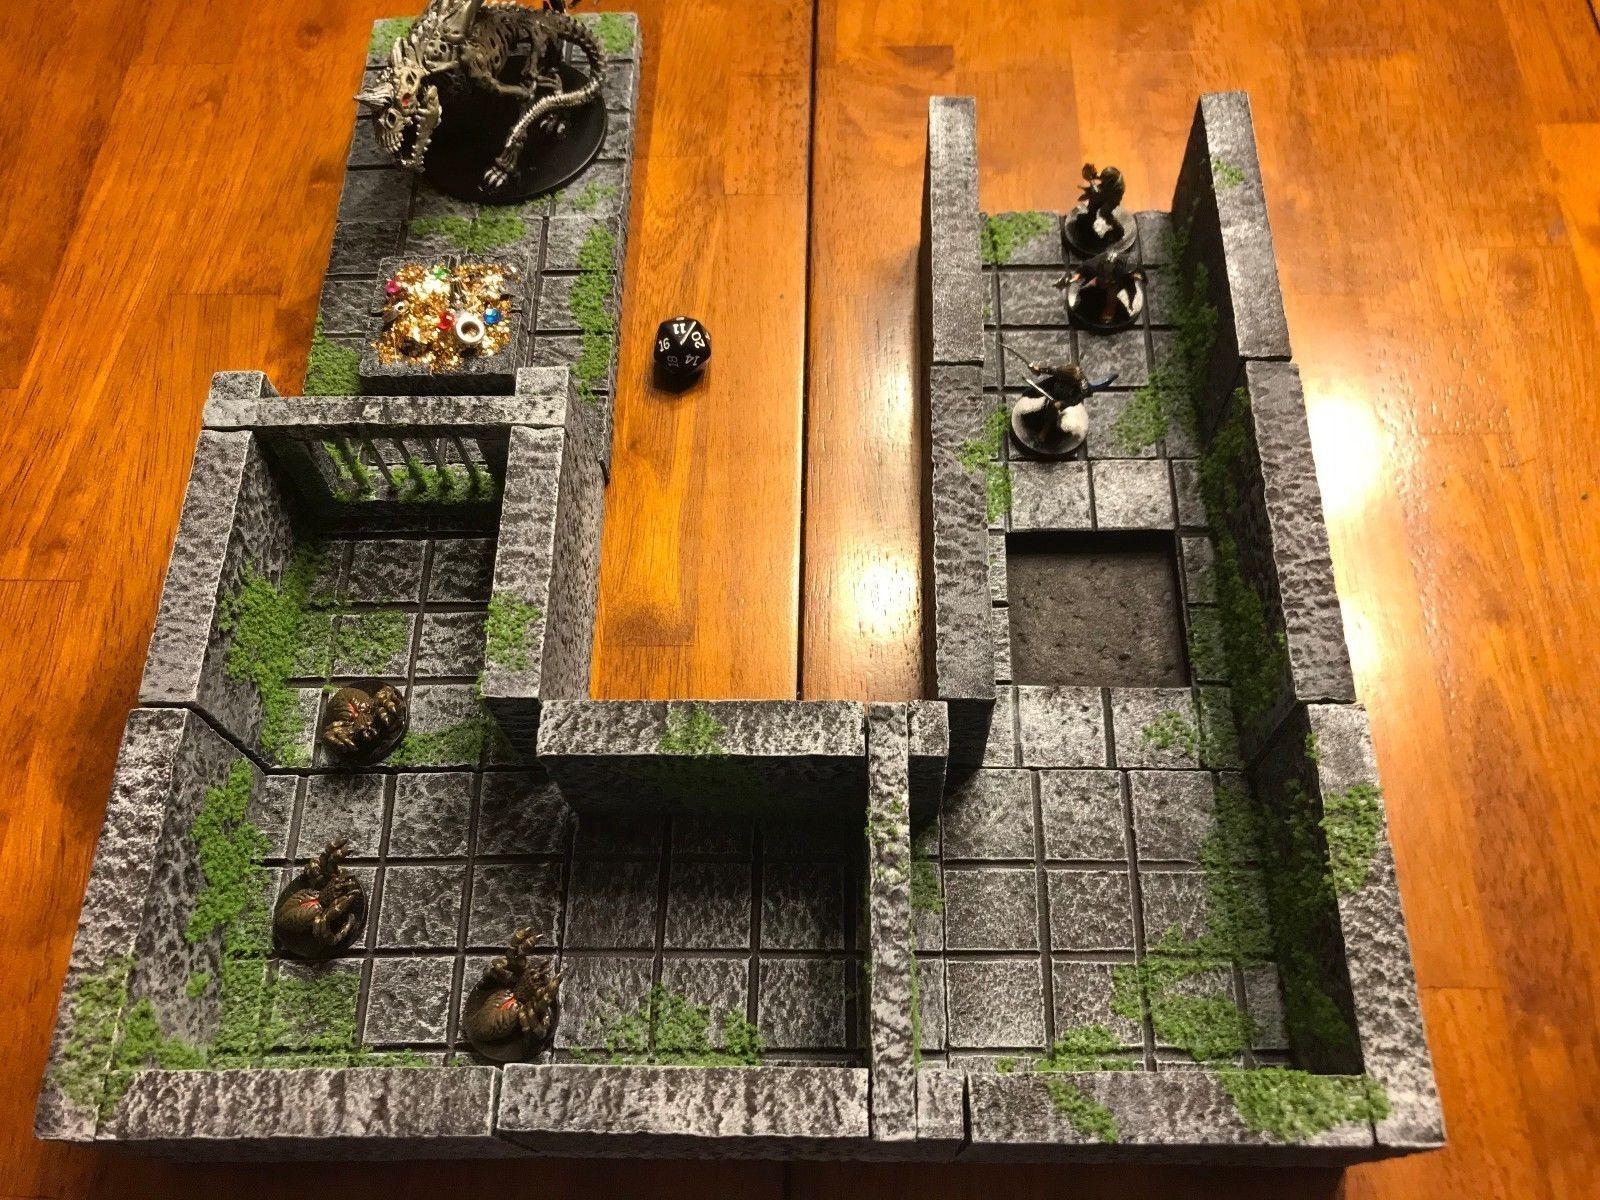 Dungeon Dungeons d&d Pathfinder Dragons & Tabletop Terrain